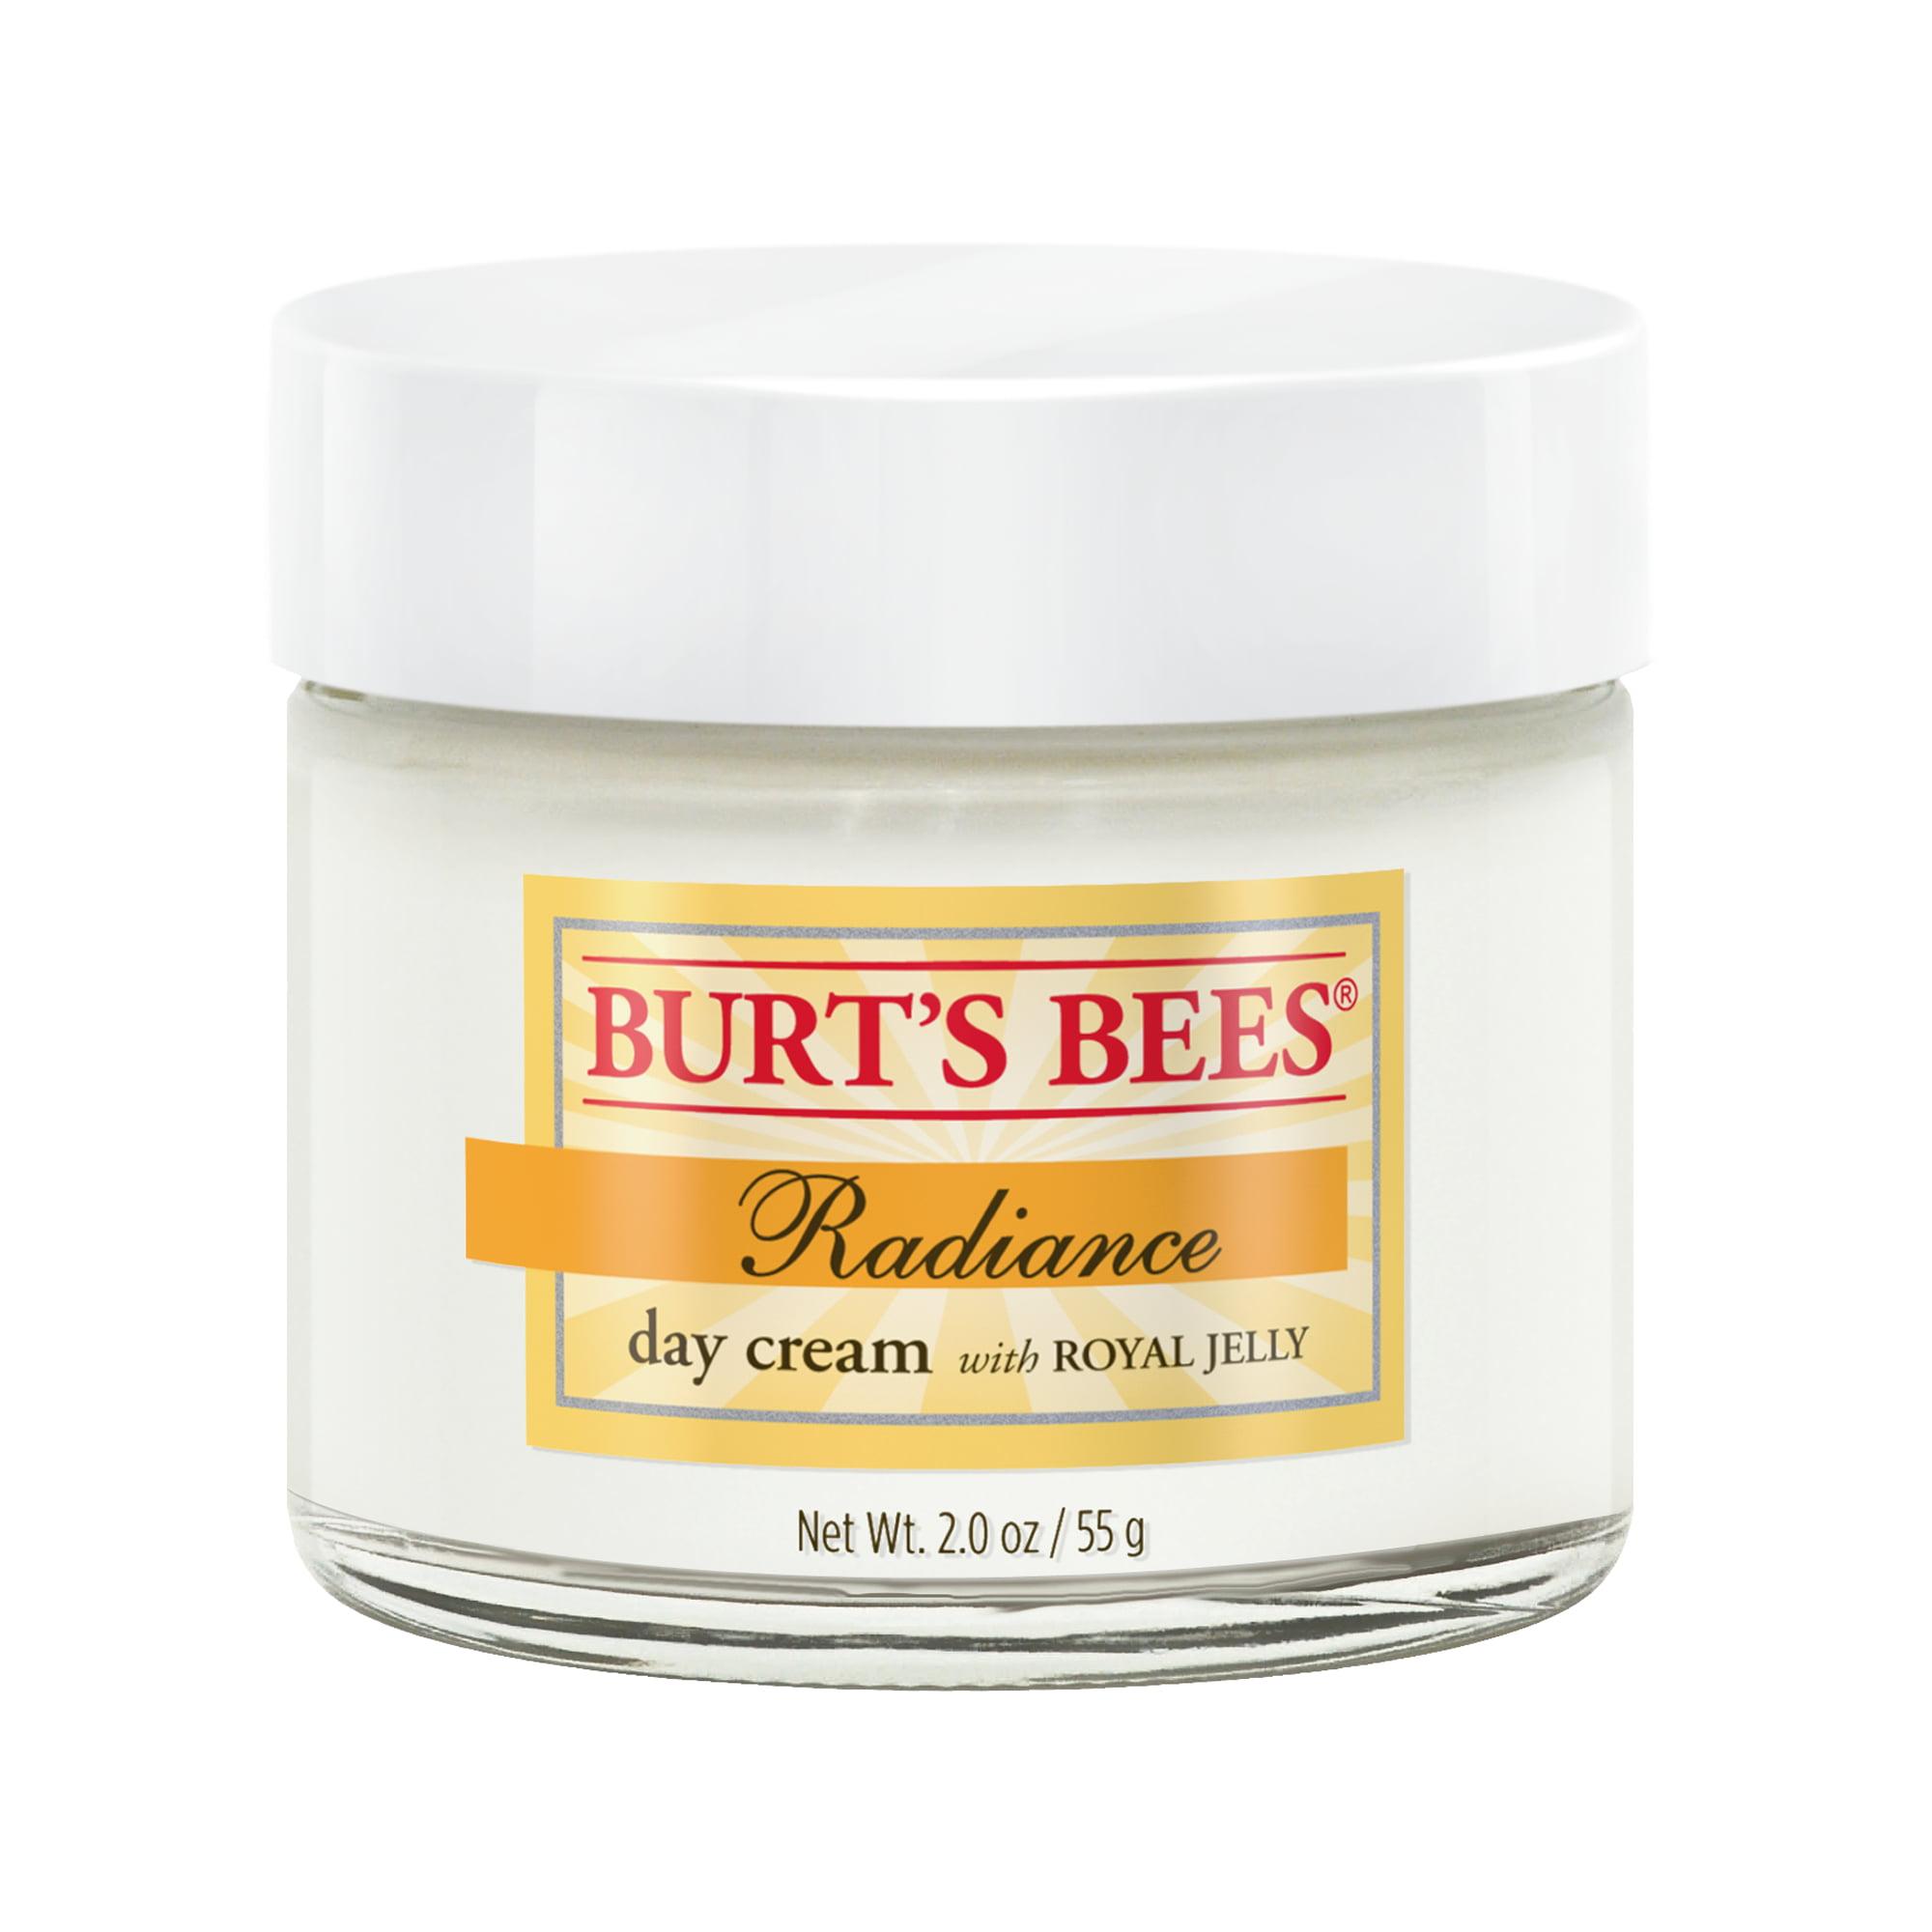 Burt's Bees Radiance Day Cream, 2 oz